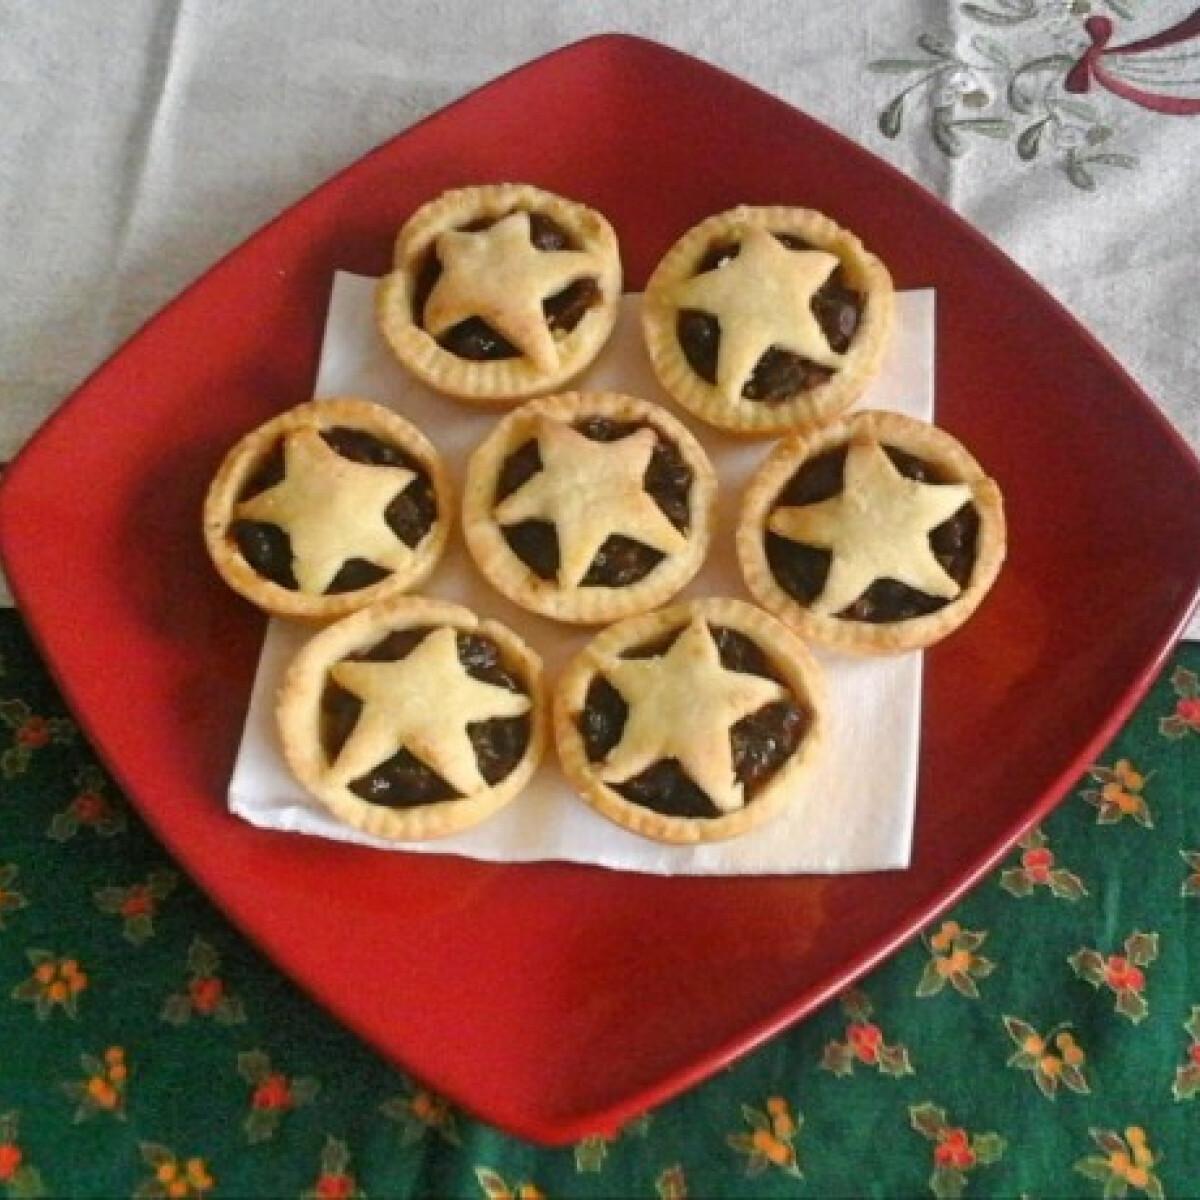 Ezen a képen: Mince pie muffin formában sütve